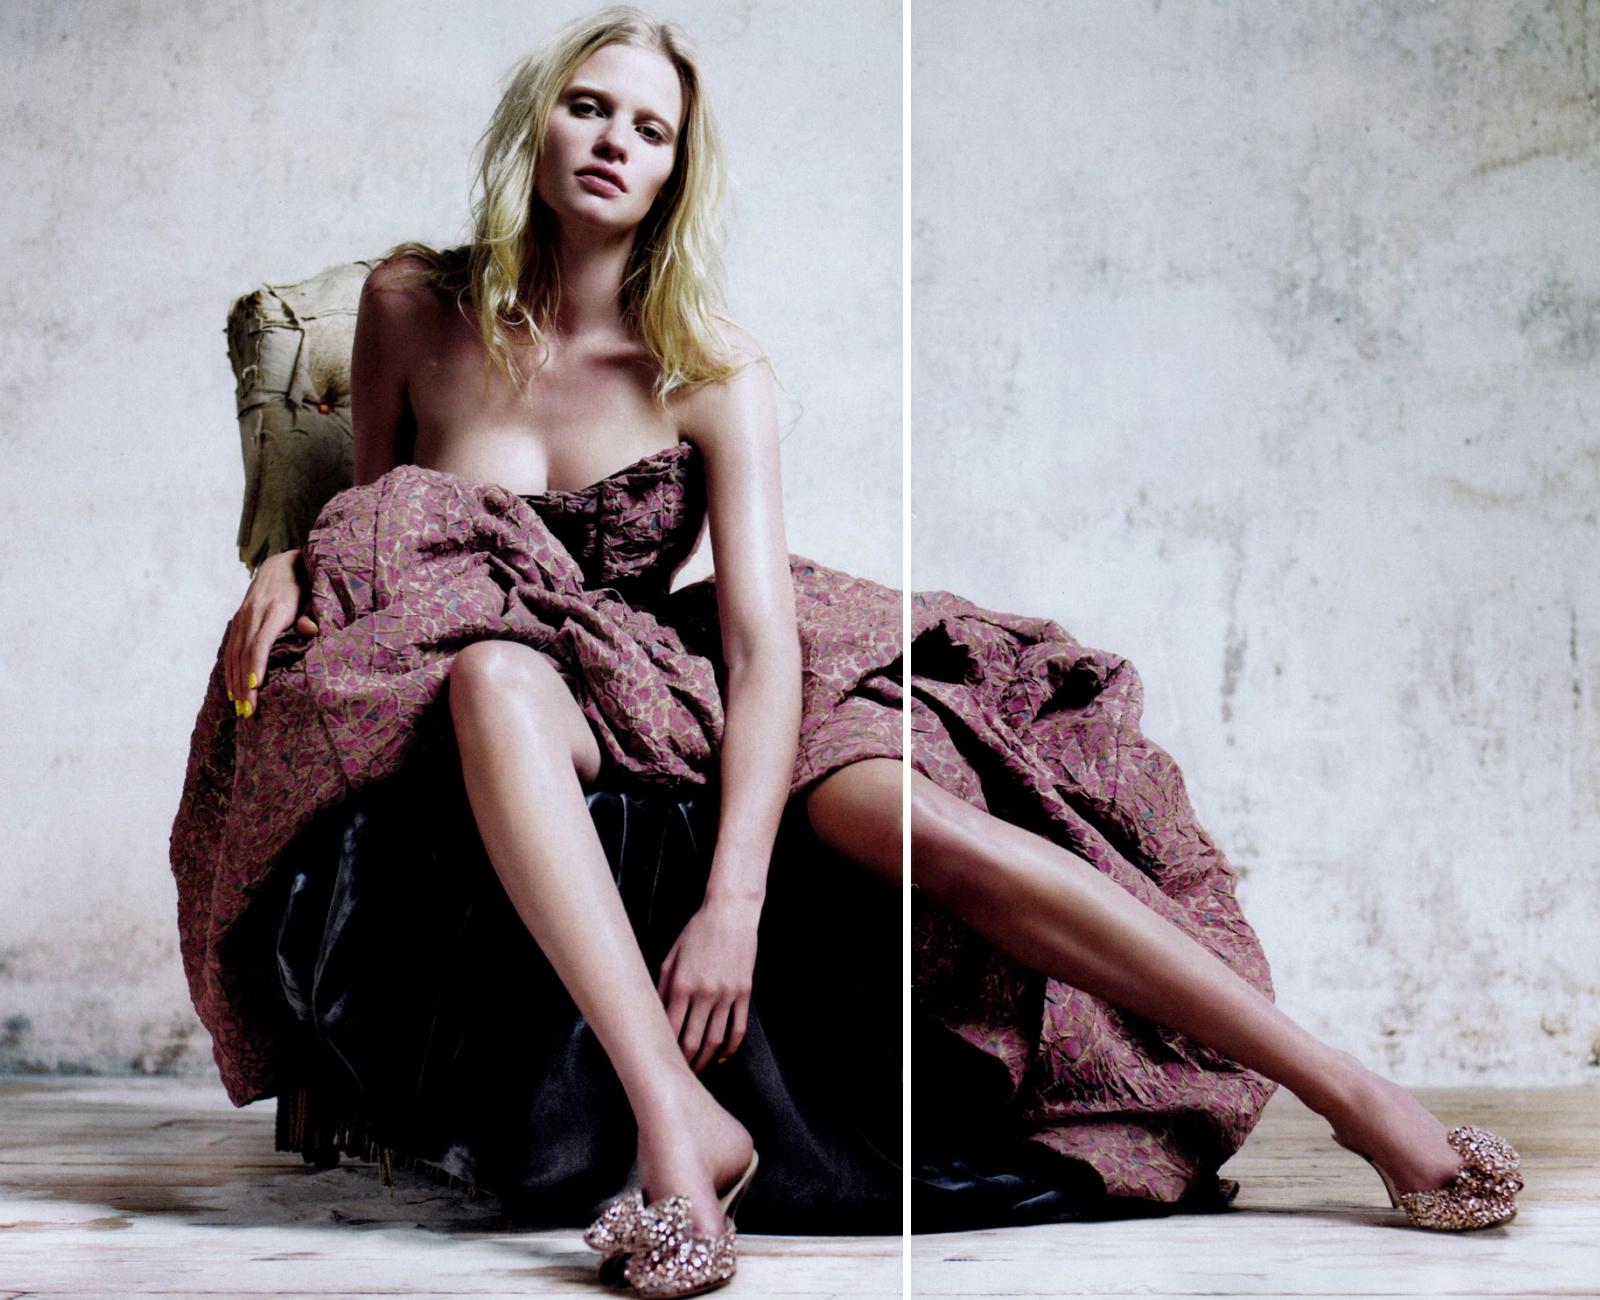 http://1.bp.blogspot.com/_Jgc-vQ1t70k/TOT0g4E3RqI/AAAAAAAAAM8/2wtueiggFQc/s1600/Lara_Stone_nude_sexy_for_Vogue_%2B1.jpg